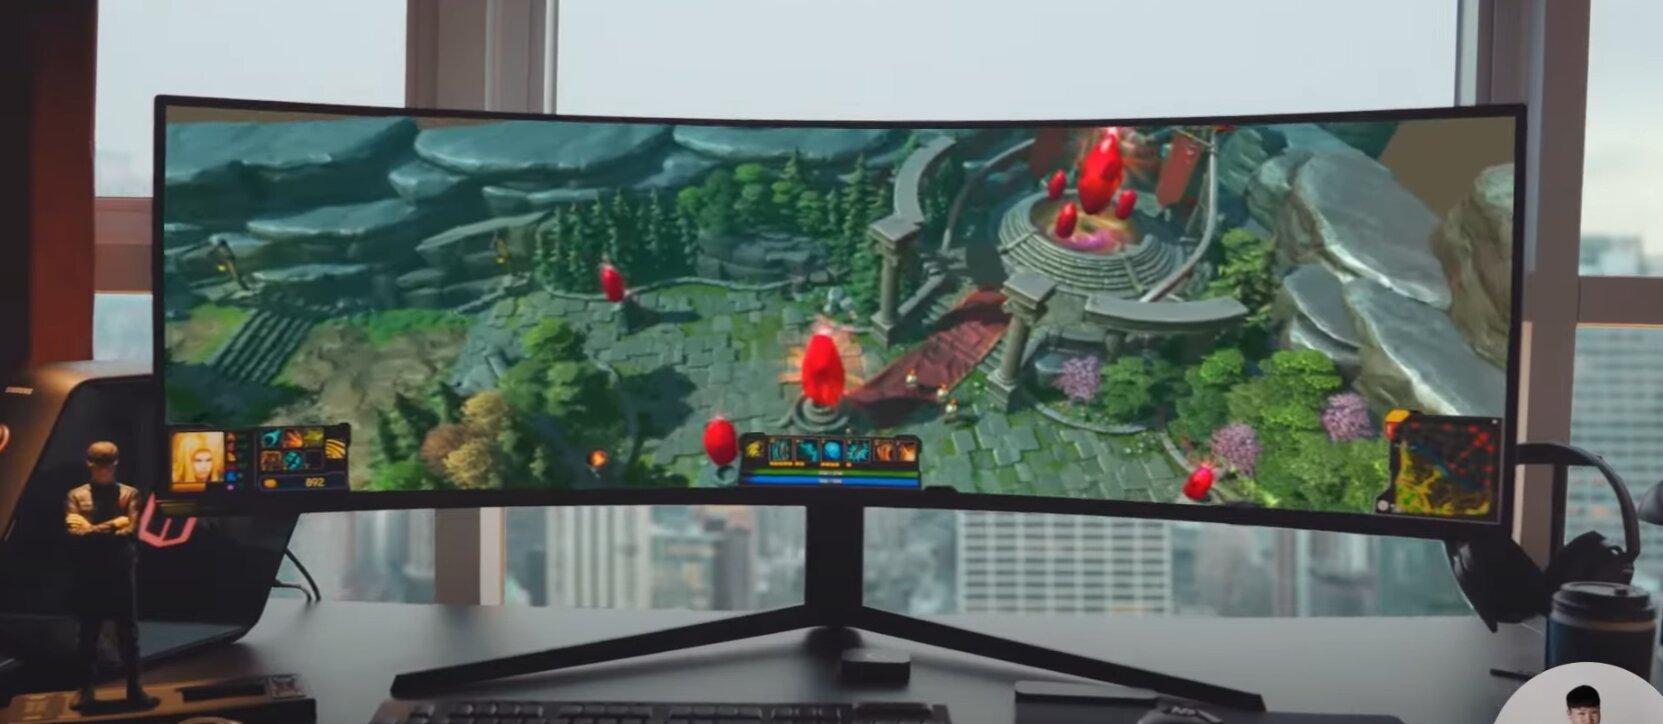 Samsung Odyssey G9 Screen (2021)